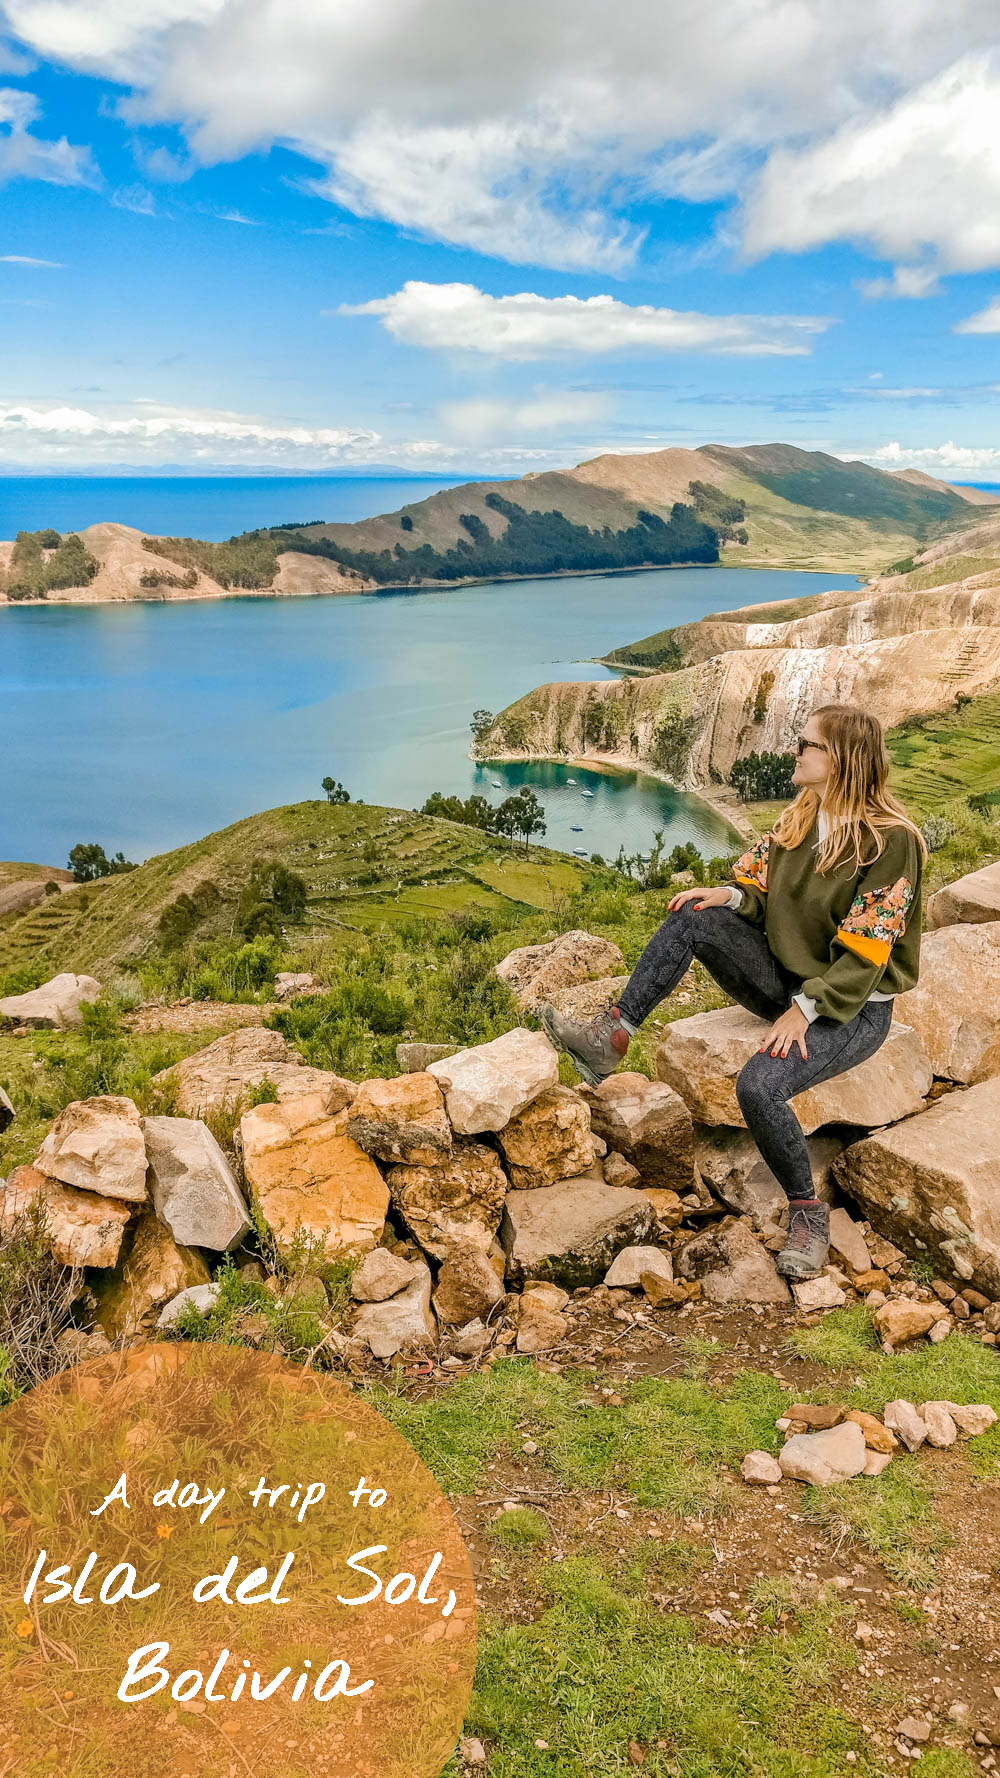 A day trip to Isla del Sol, Bolivia | Aliz's Wonderland